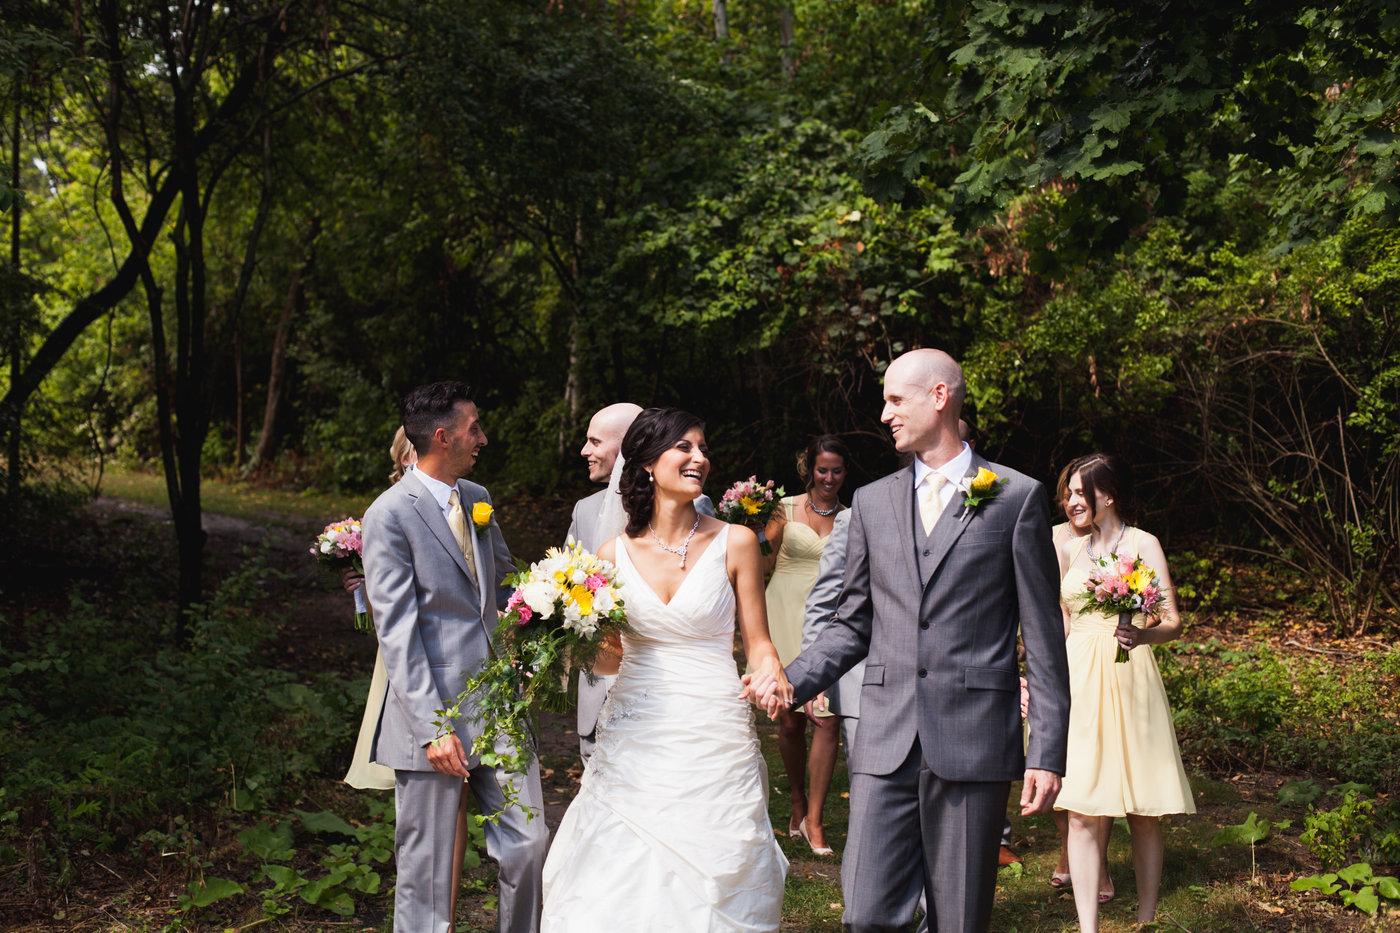 Jacquie Sean Wedding-Family Photos Bridal Party-0107.jpg